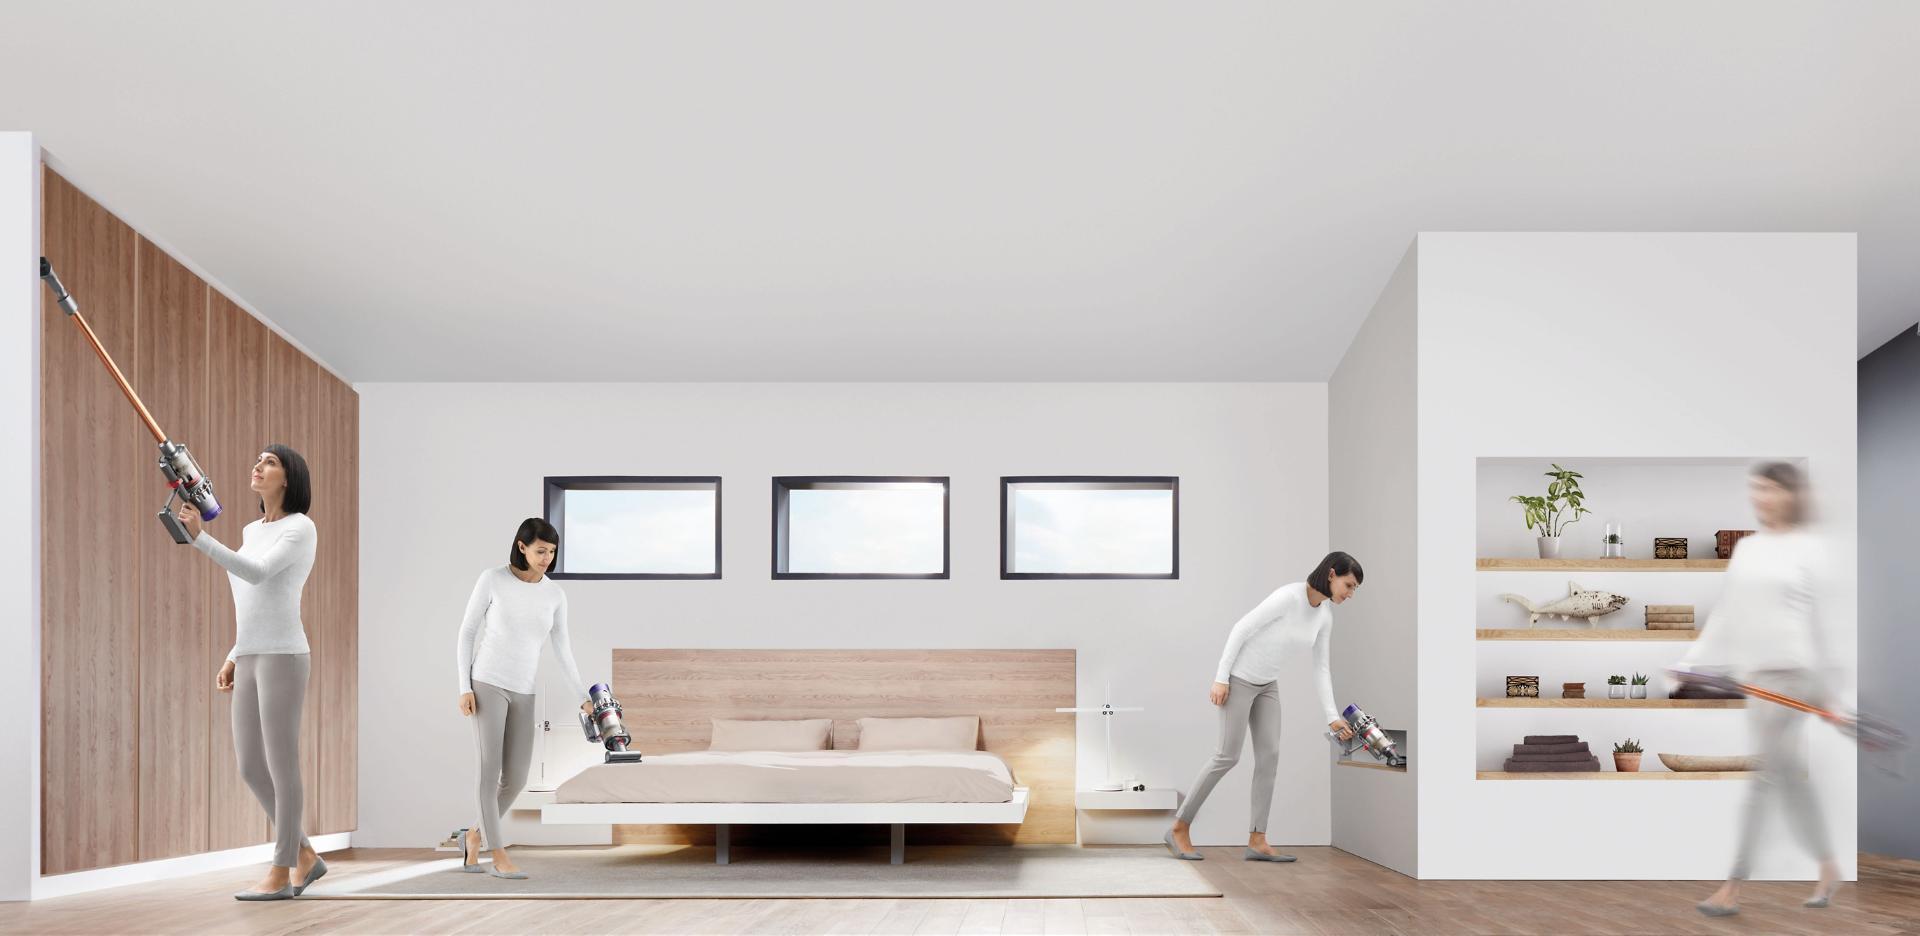 Dyson Cyclone V10™ elektrikli süpürge evi temizlerken